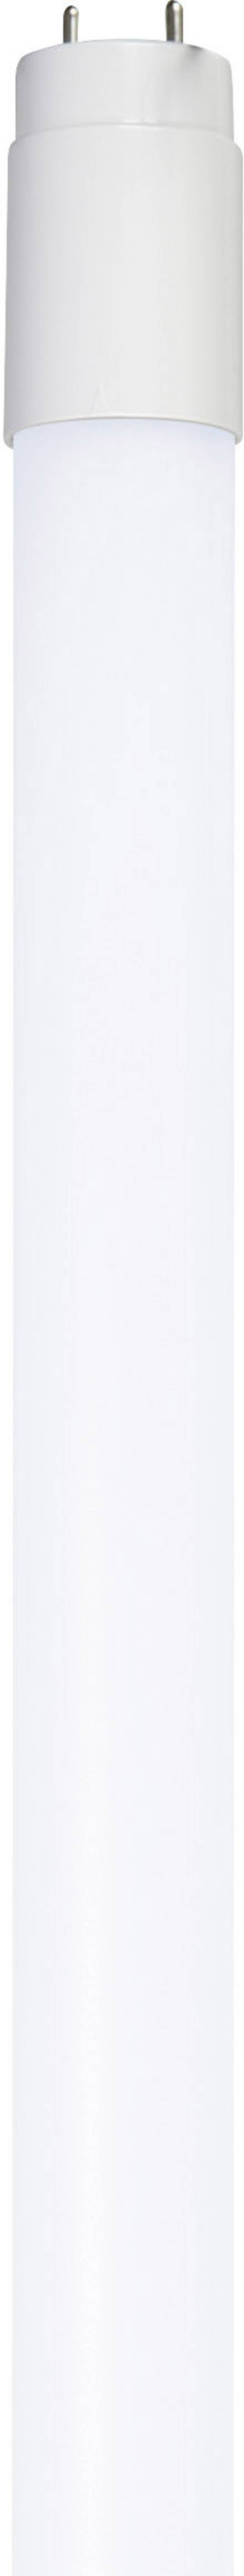 LED žarnica G13 oblika cevi VVG, KVG 10 W hladno bela (premer x D) 28 mm x 600 mm EEK: A+ Sygonix 1 kos